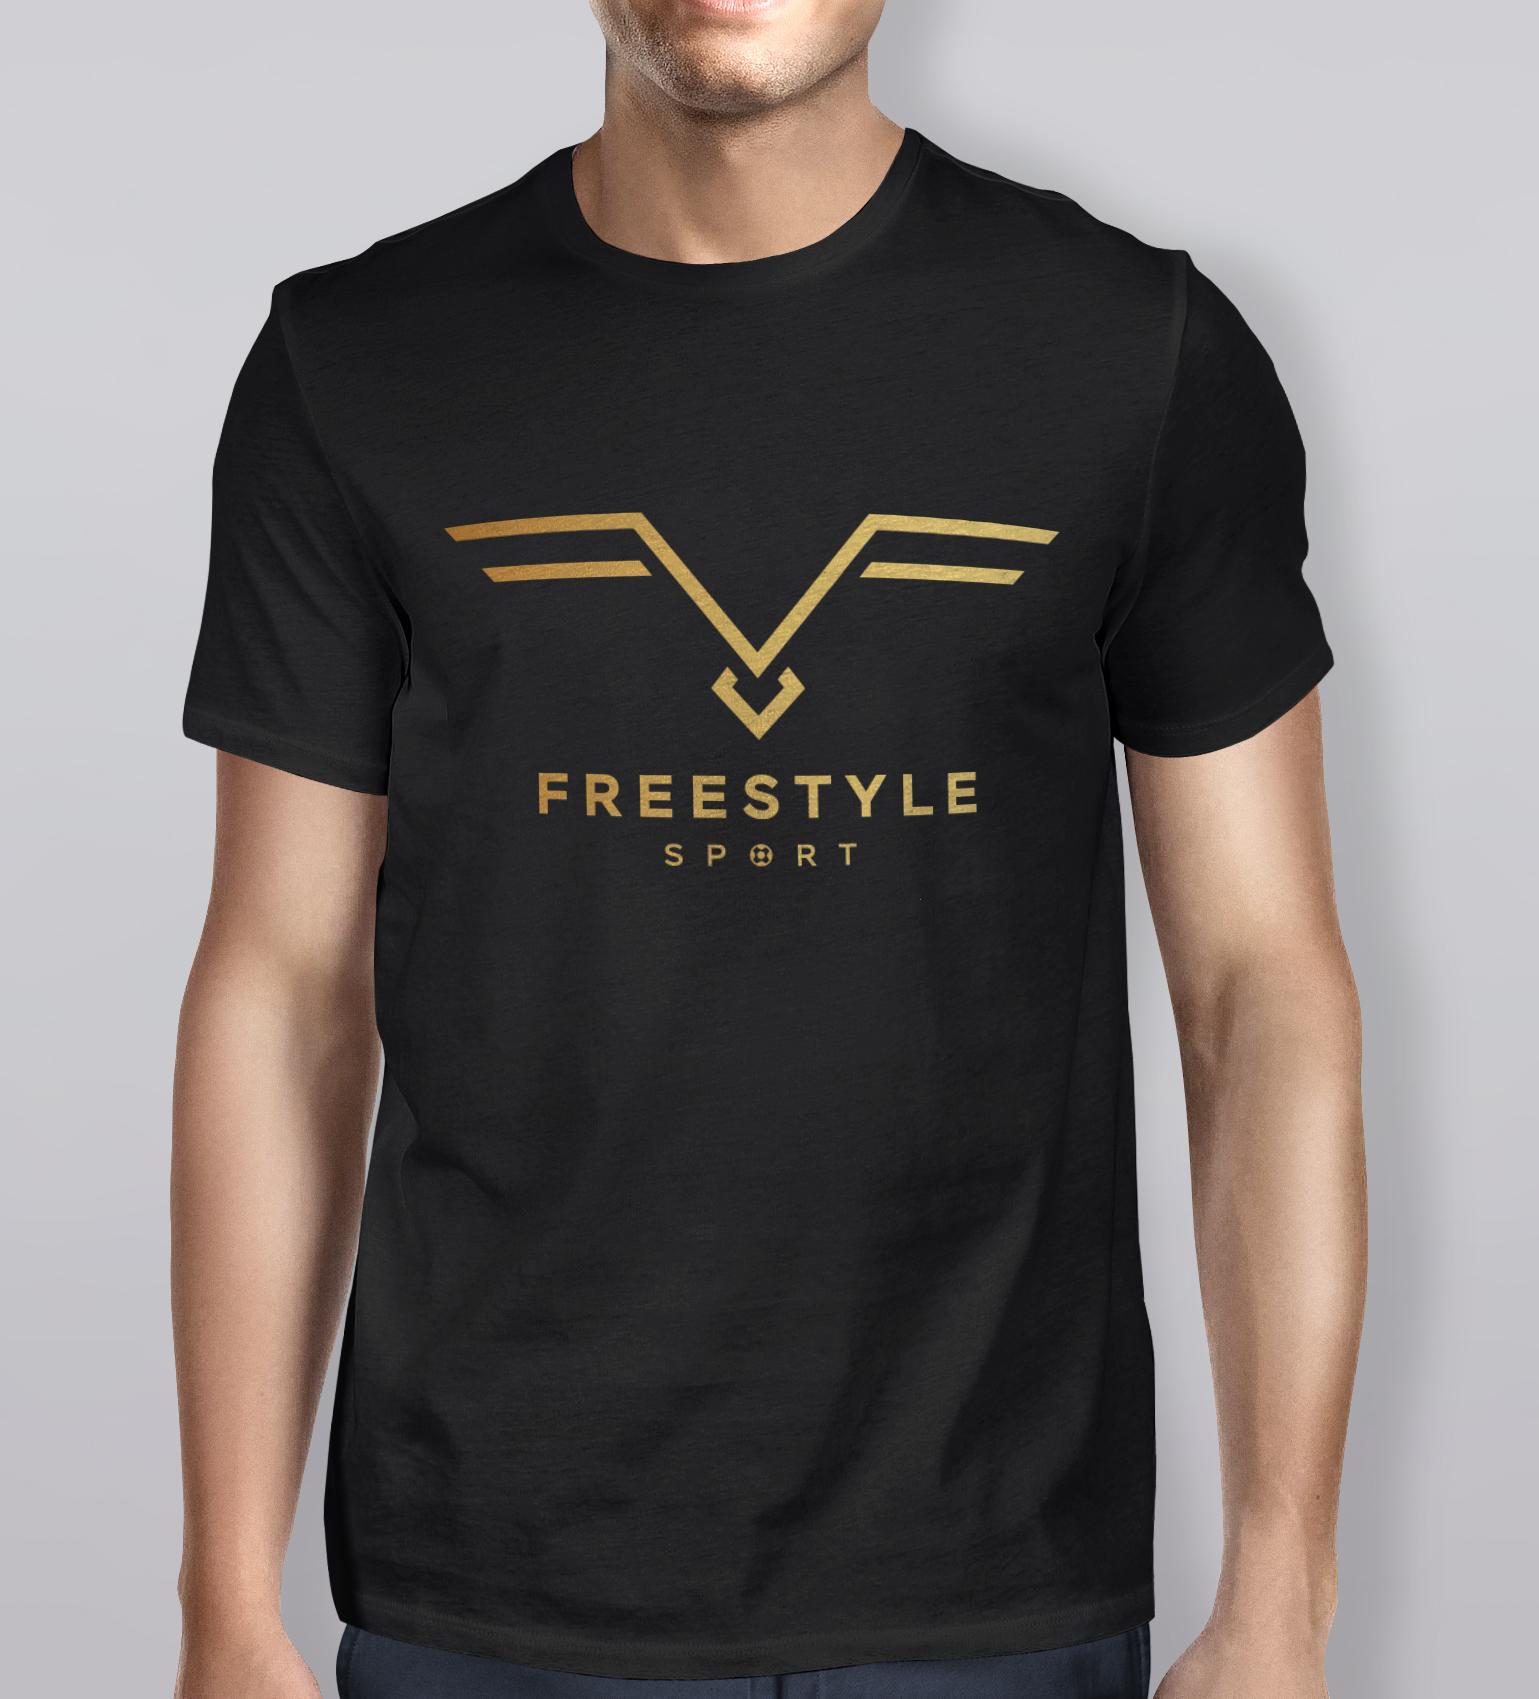 FreeStyle 2